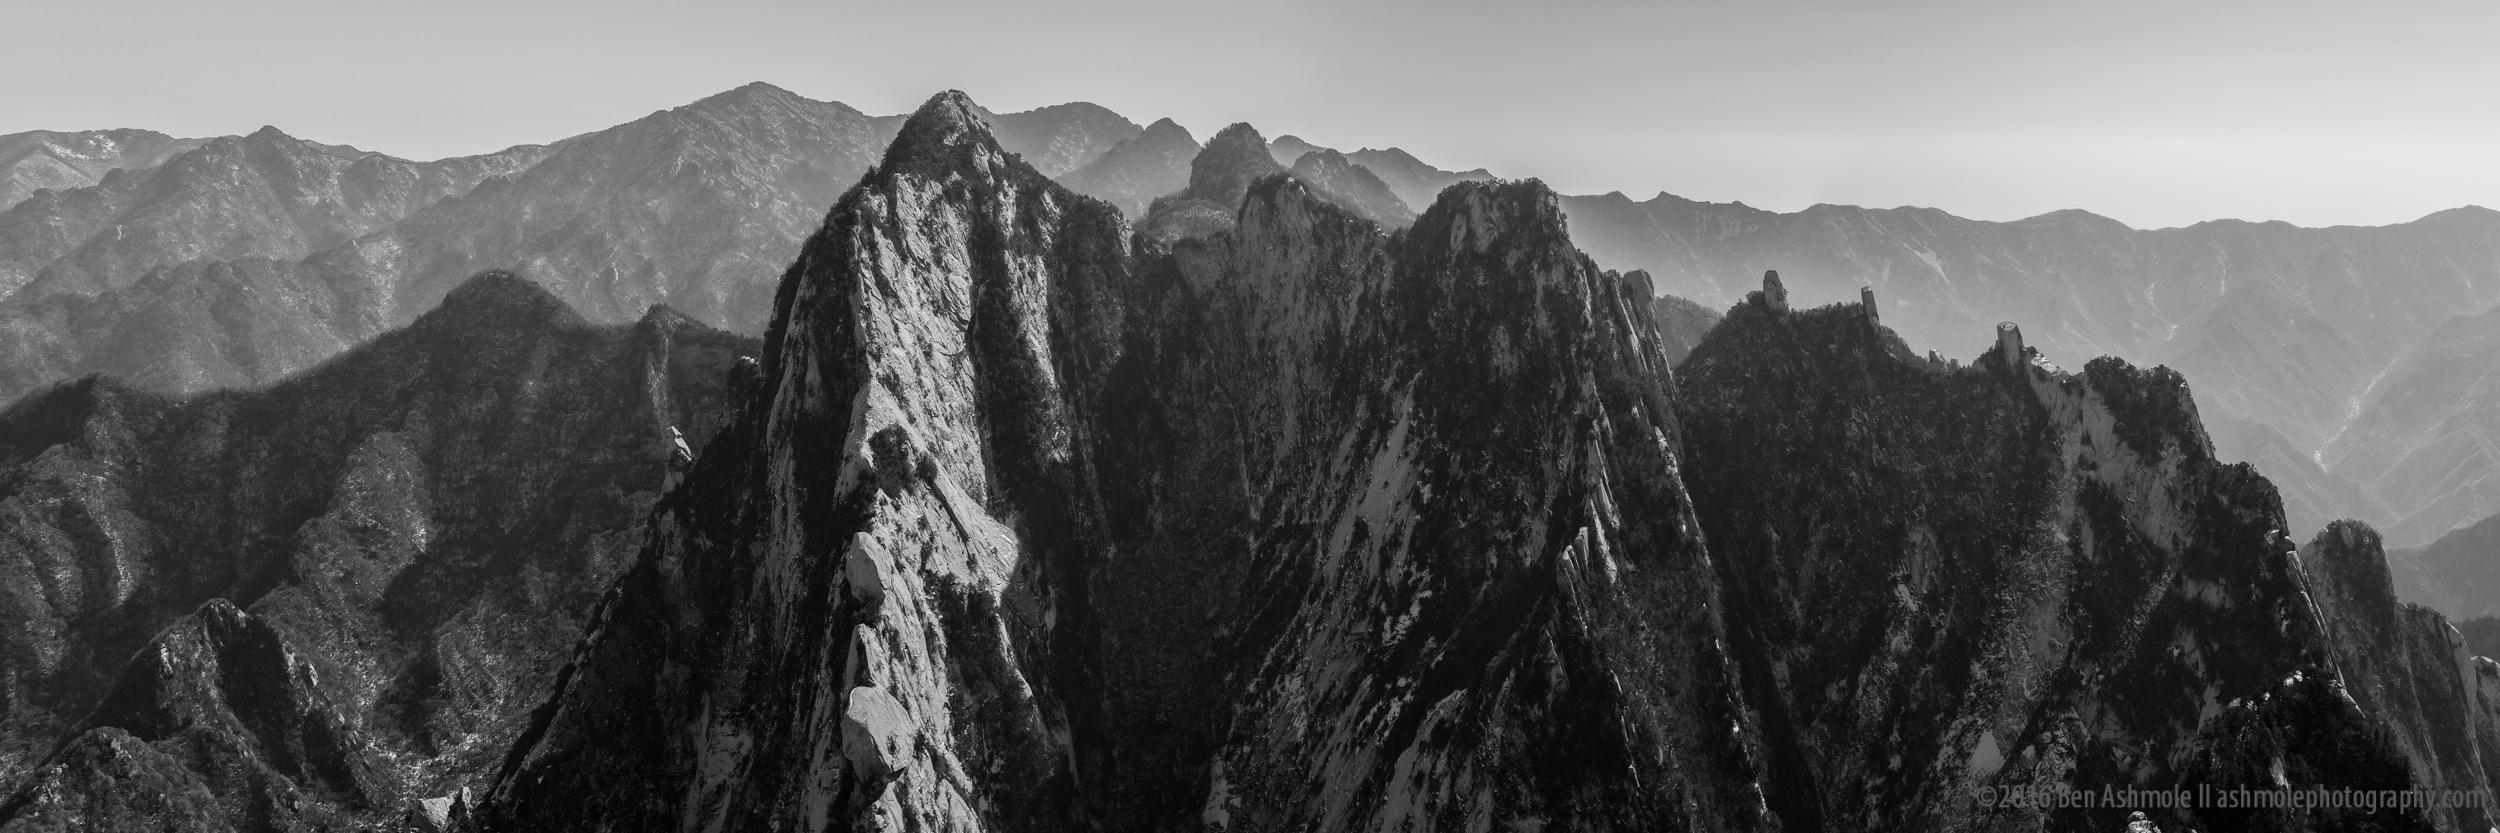 Hua Shan Mountain Range, Shaanxi Province, China